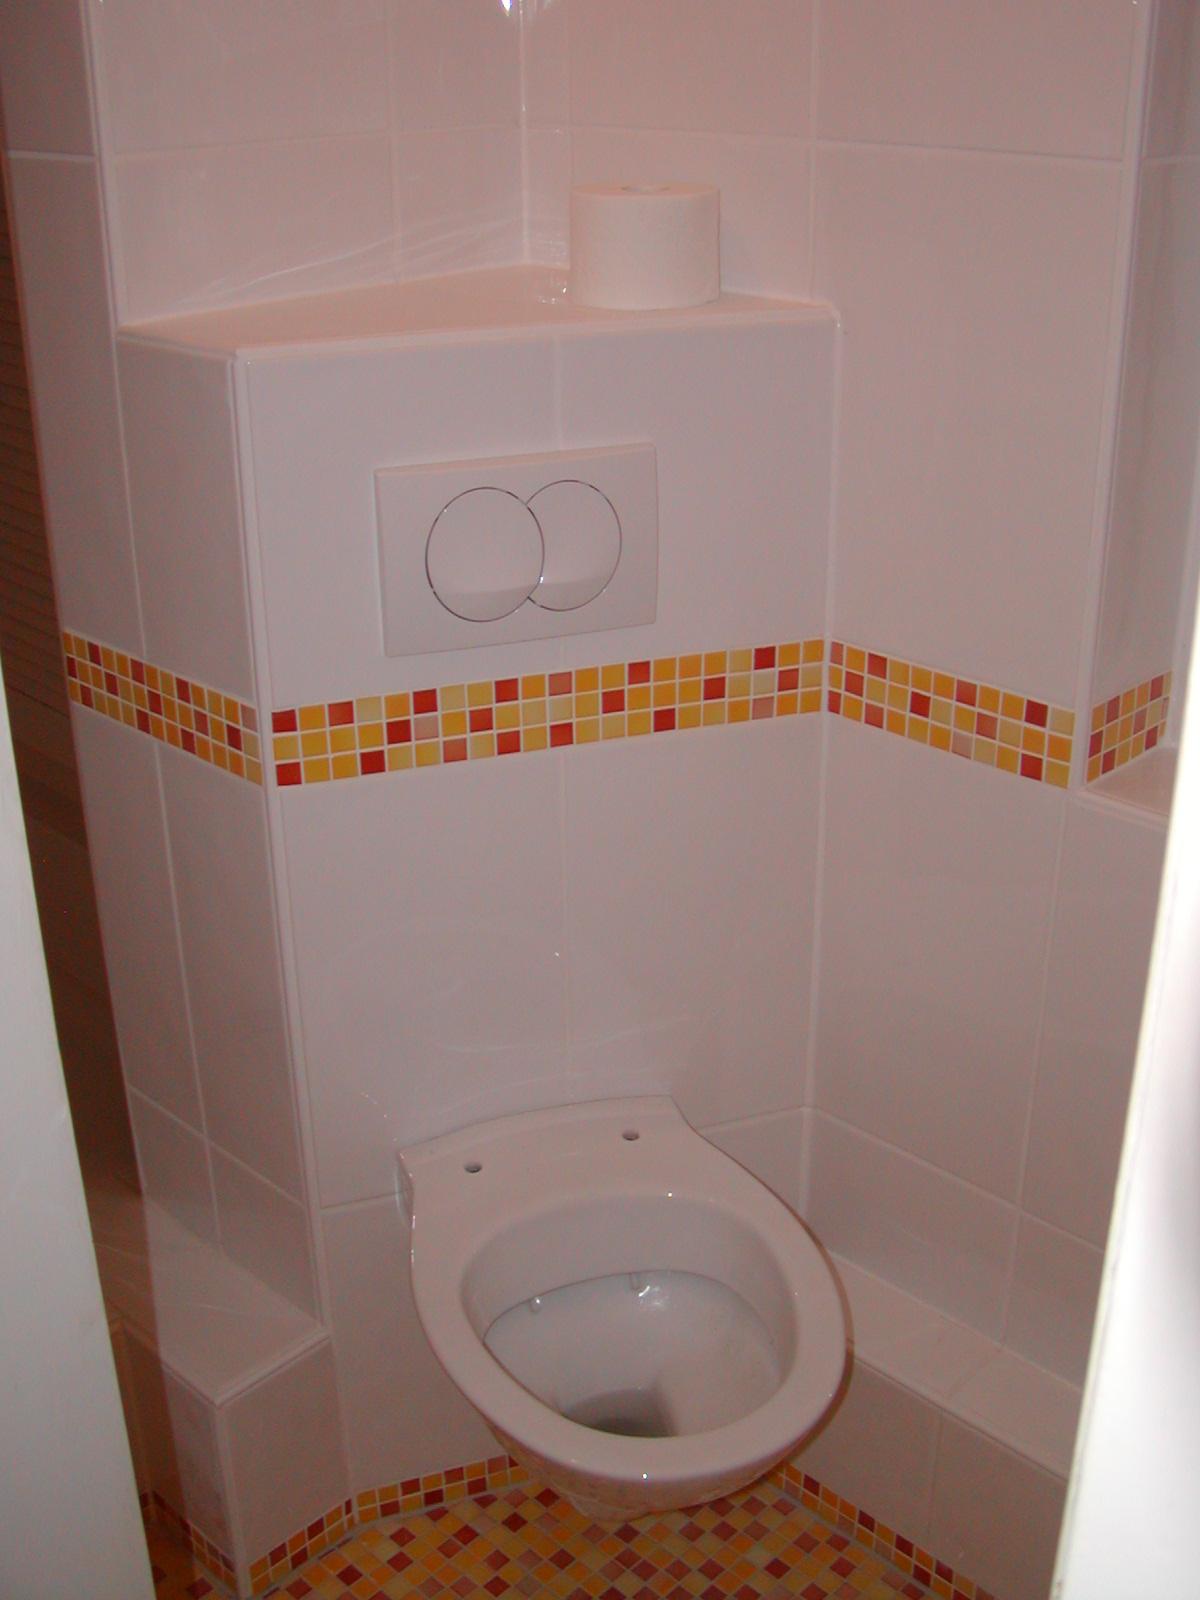 Badezimmer Fliesen Mosaik Bordure Mosaik Bordure Die Besten